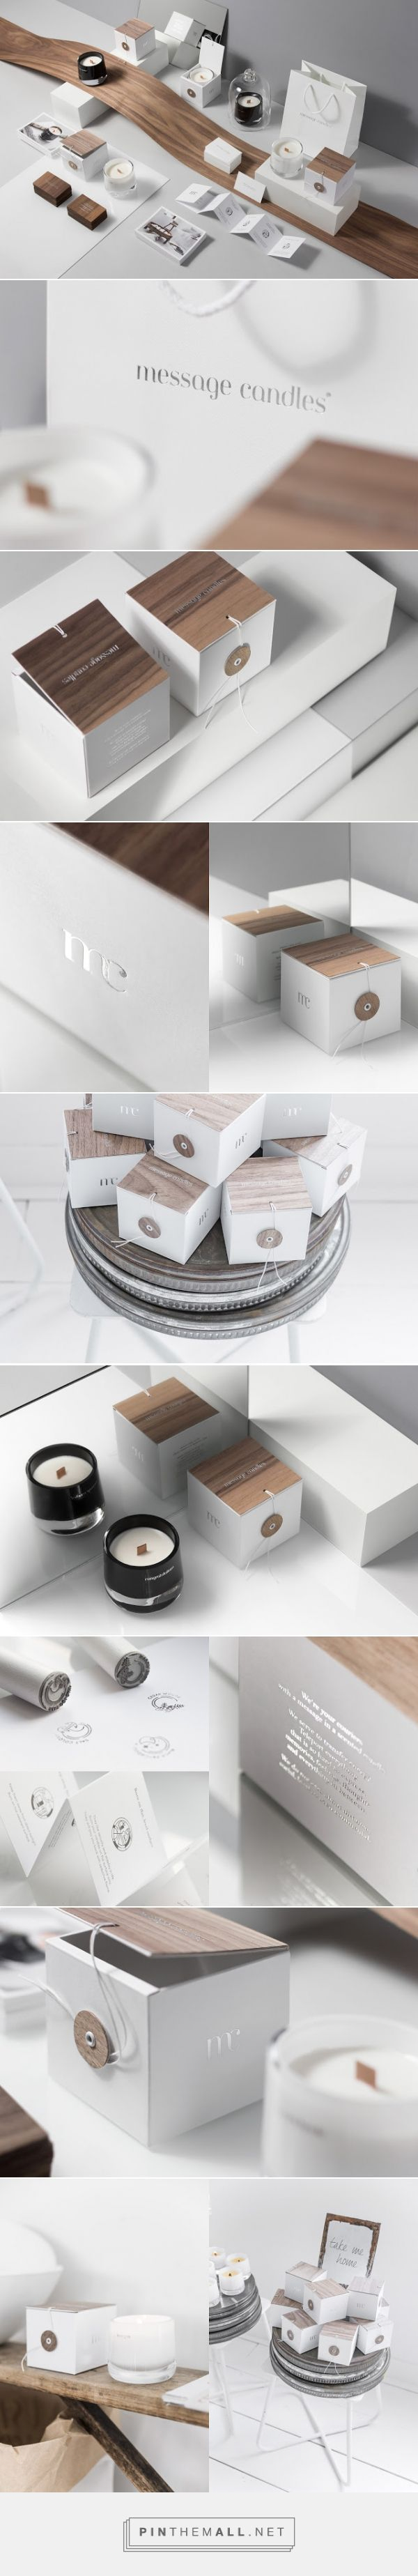 best 디자인패키지 images on Pinterest Design packaging Label